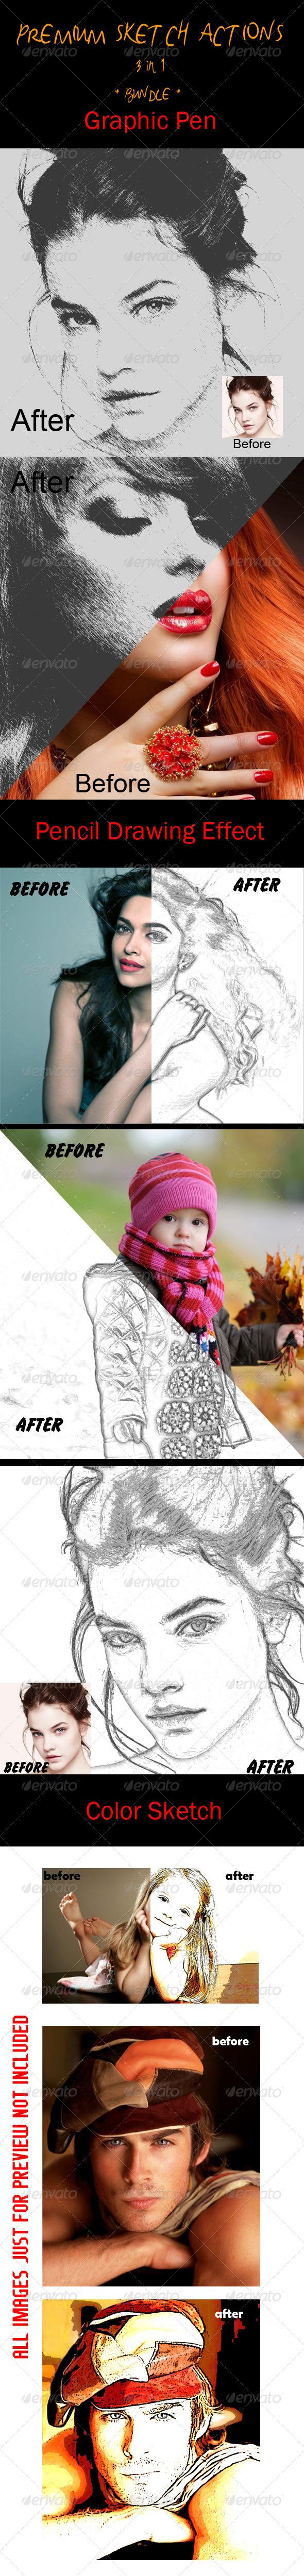 GraphicRiver Premium Sketch Actions 5820577